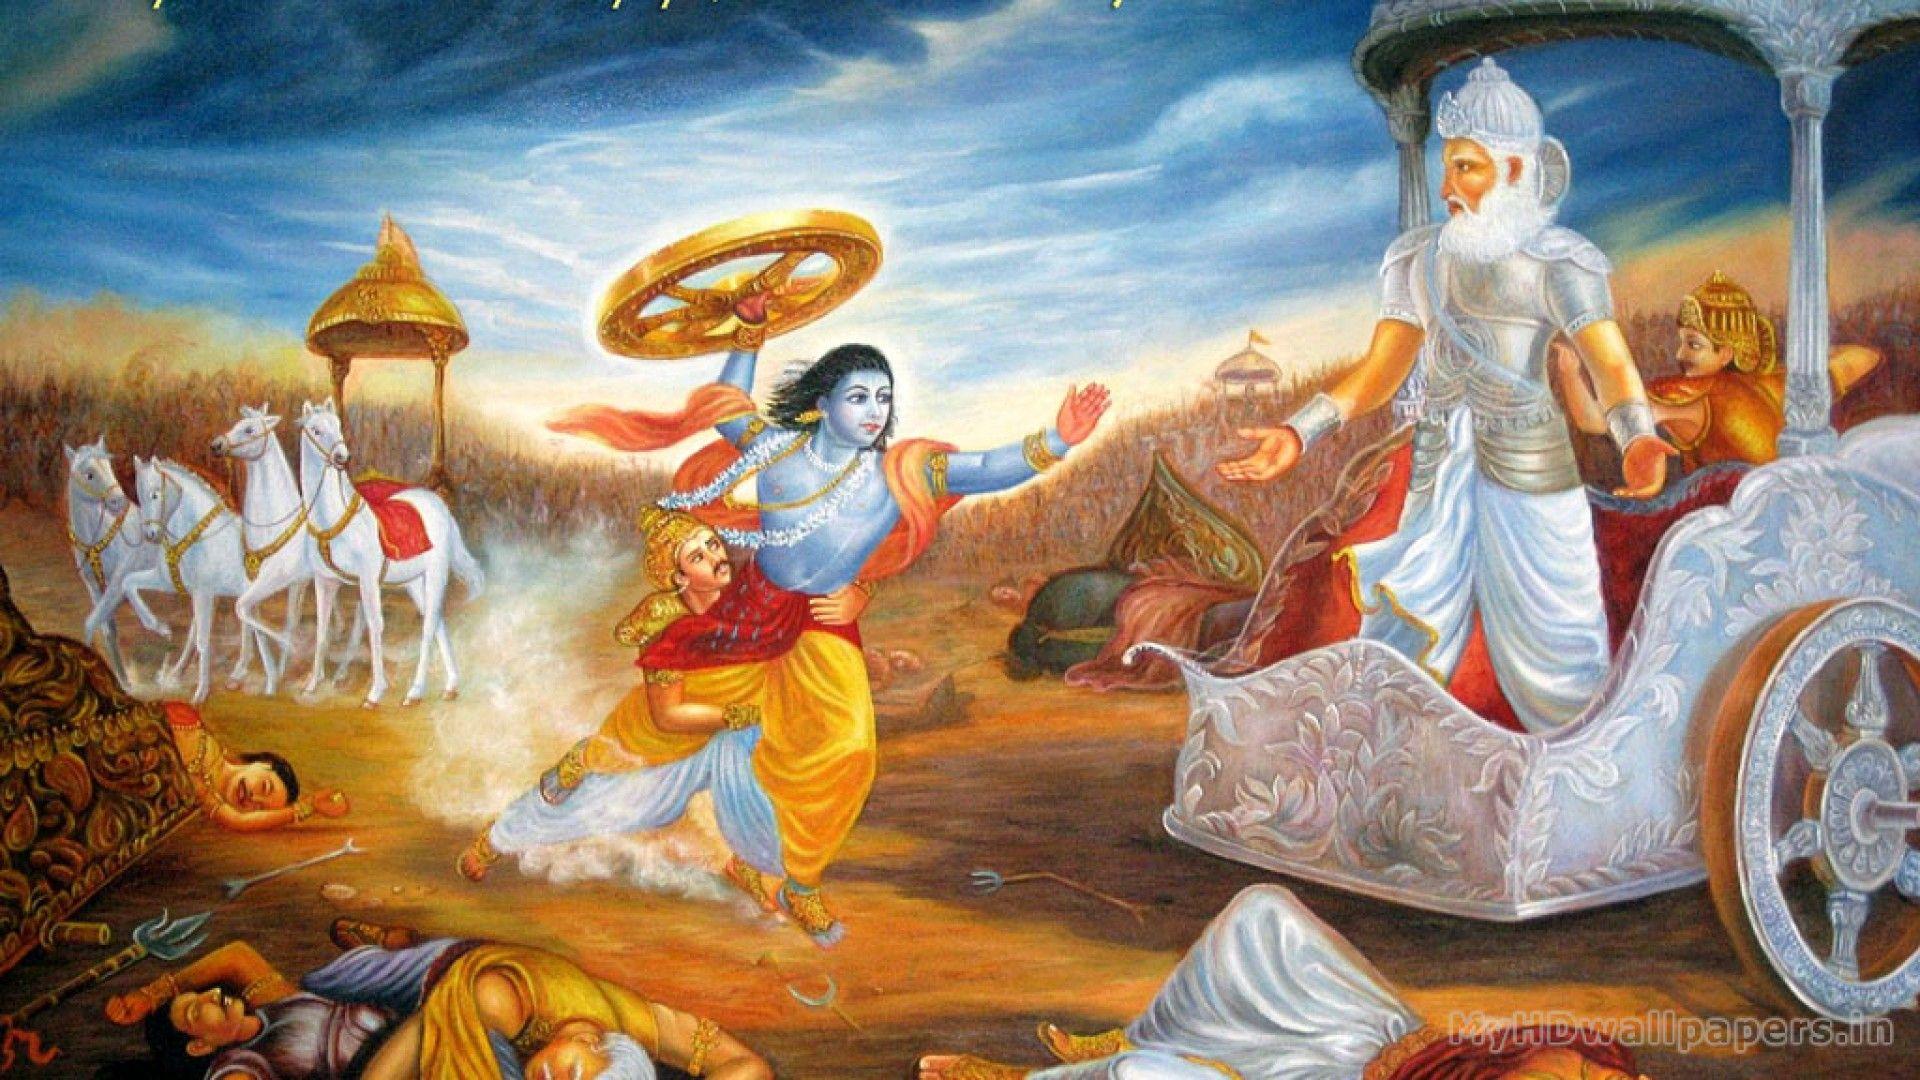 Click Here To Download In Hd Format Mahabharat Wallpaper Desktop Http Www Superwallpapers In Wa Lord Krishna Images Radha Krishna Art Krishna Art